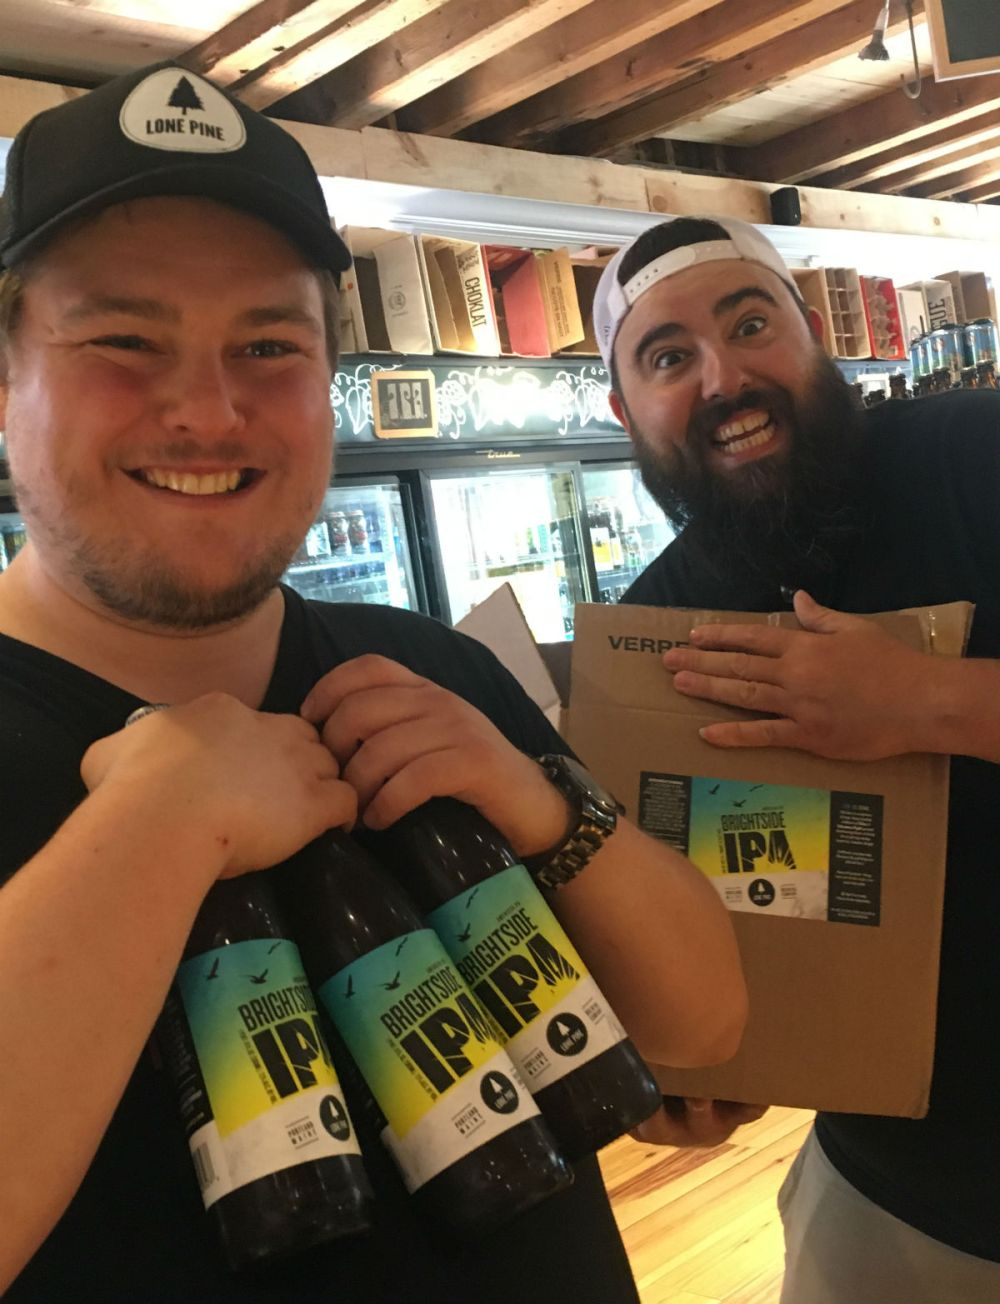 top_ten_list_lone_pine_brewing_brightside_ipa